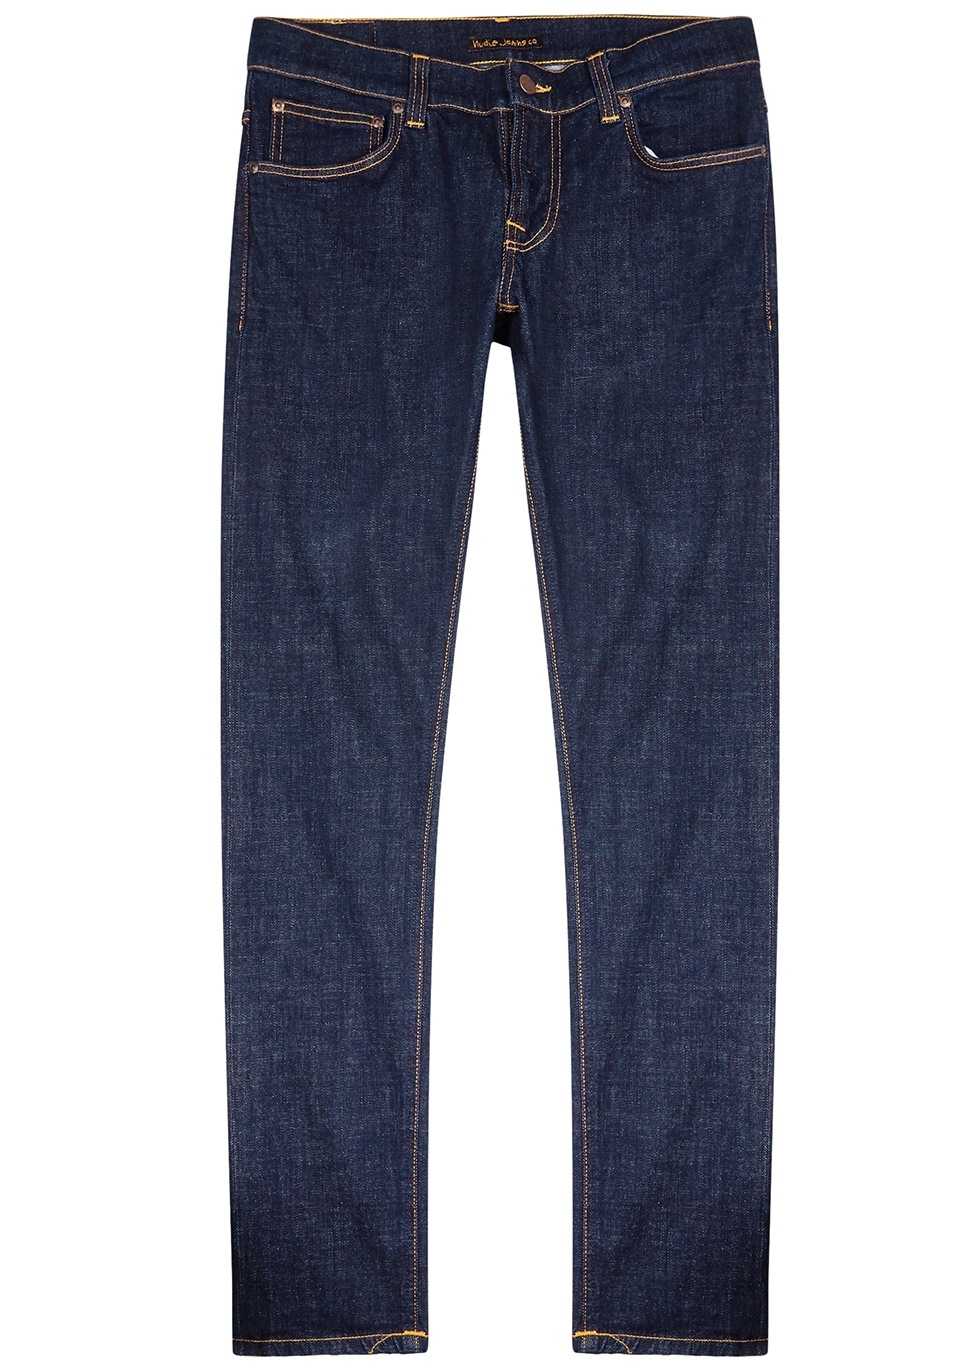 Tight Terry indigo skinny jeans